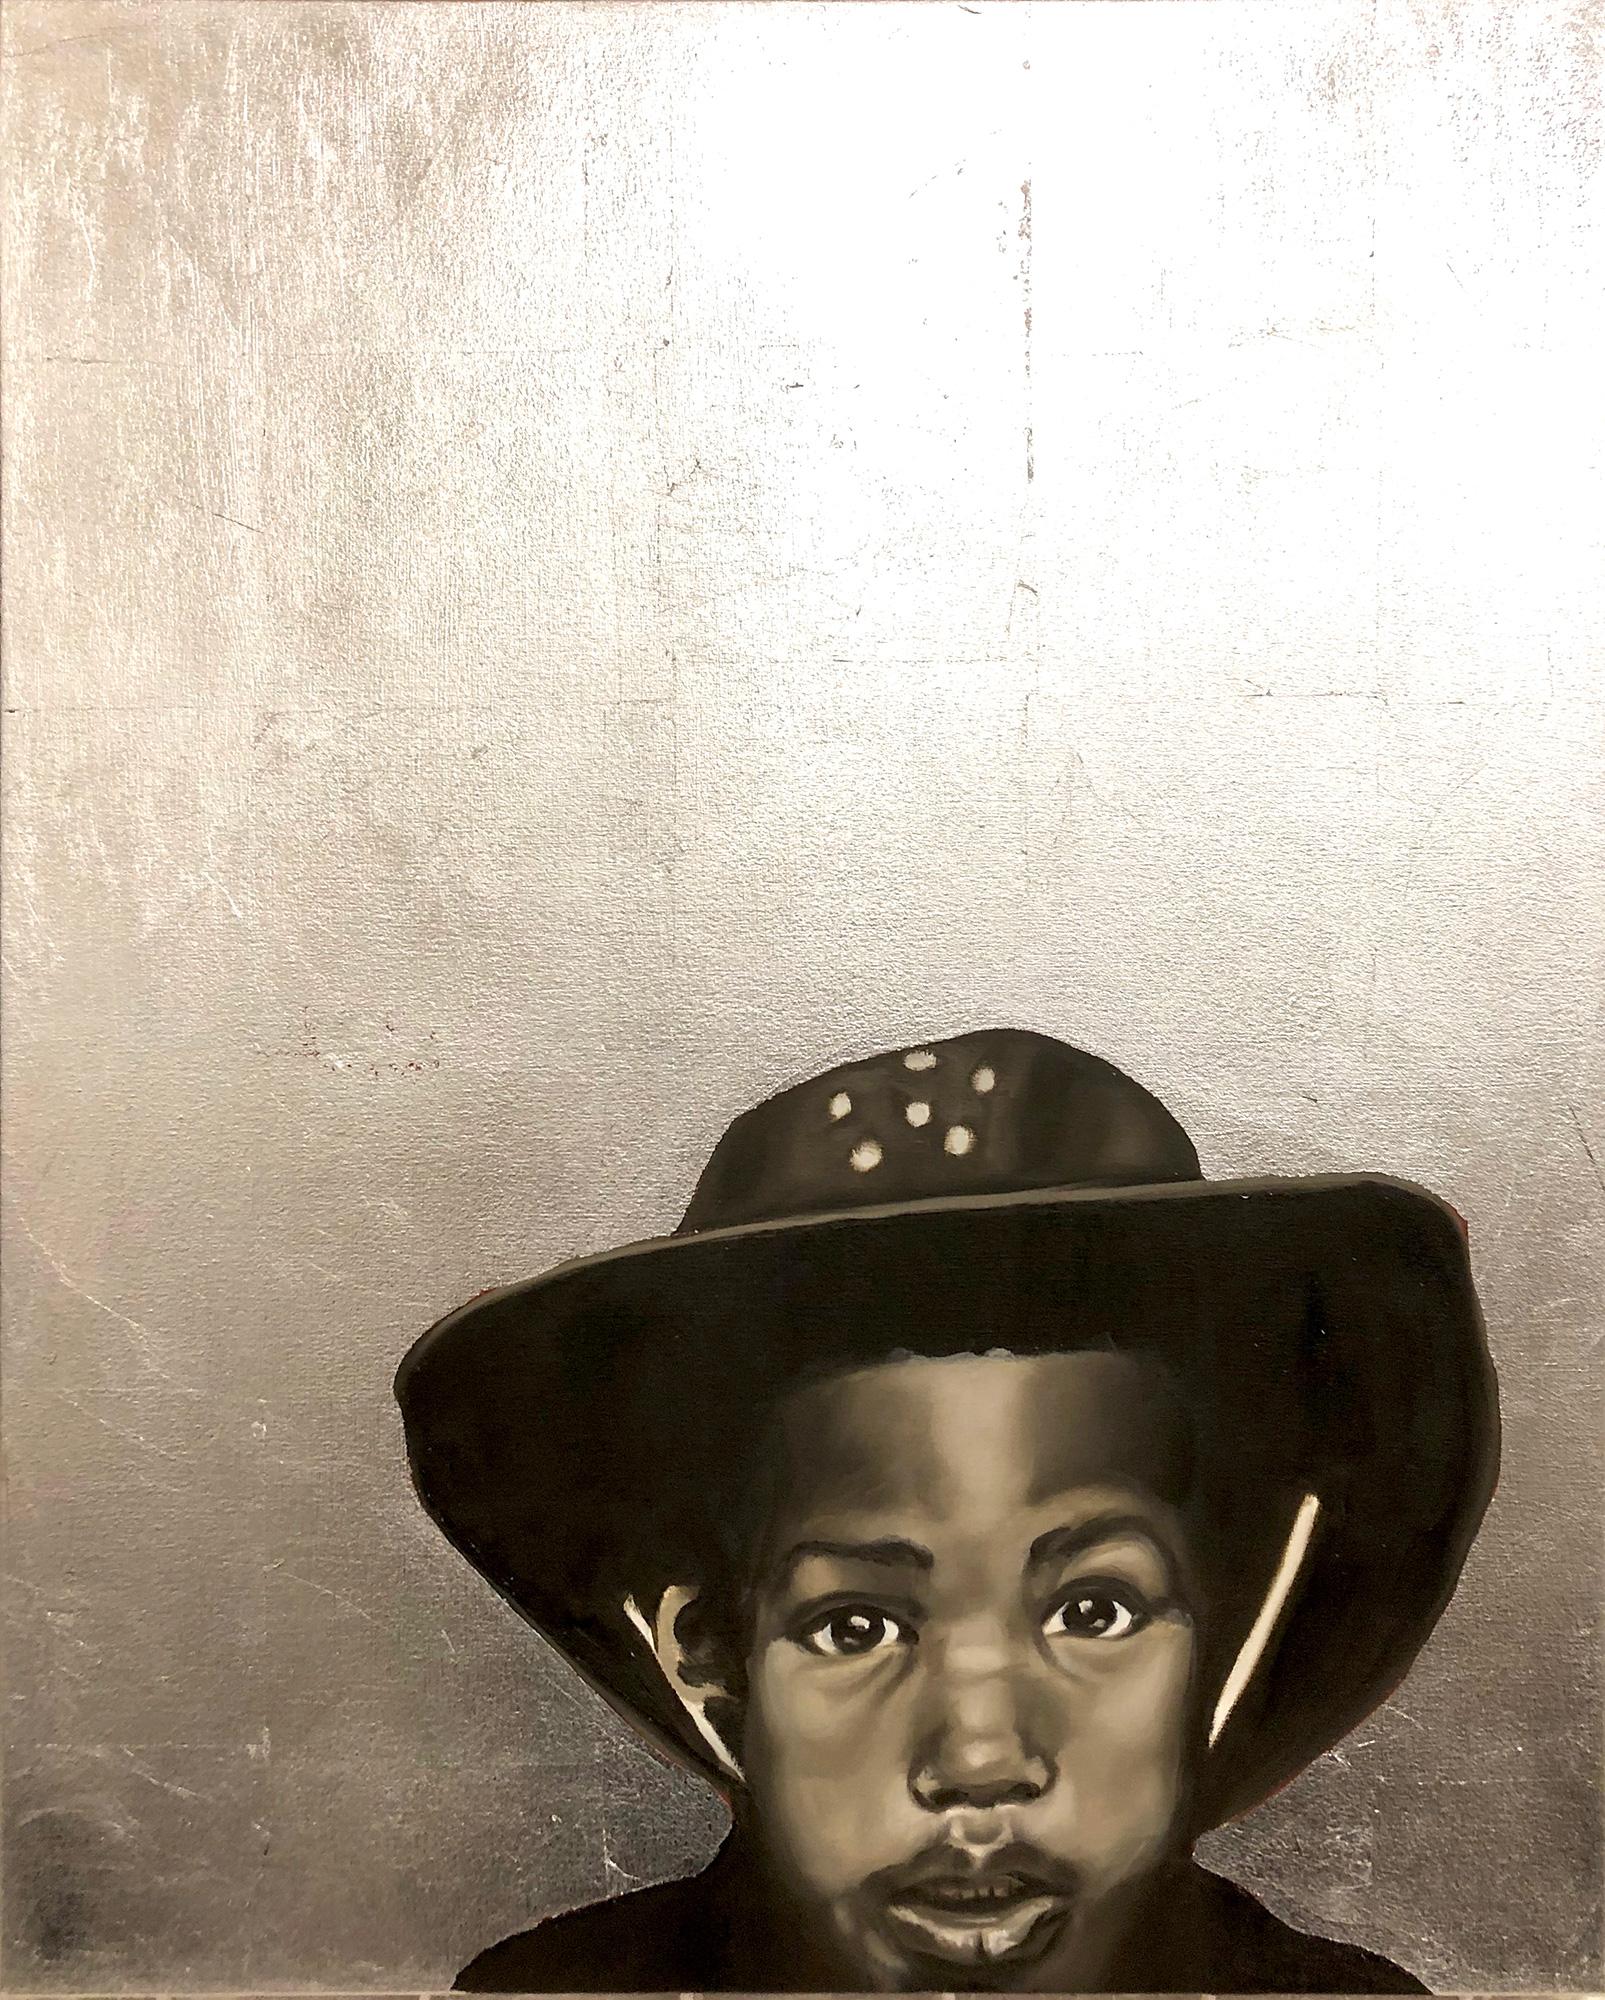 Morin Boy in Hat